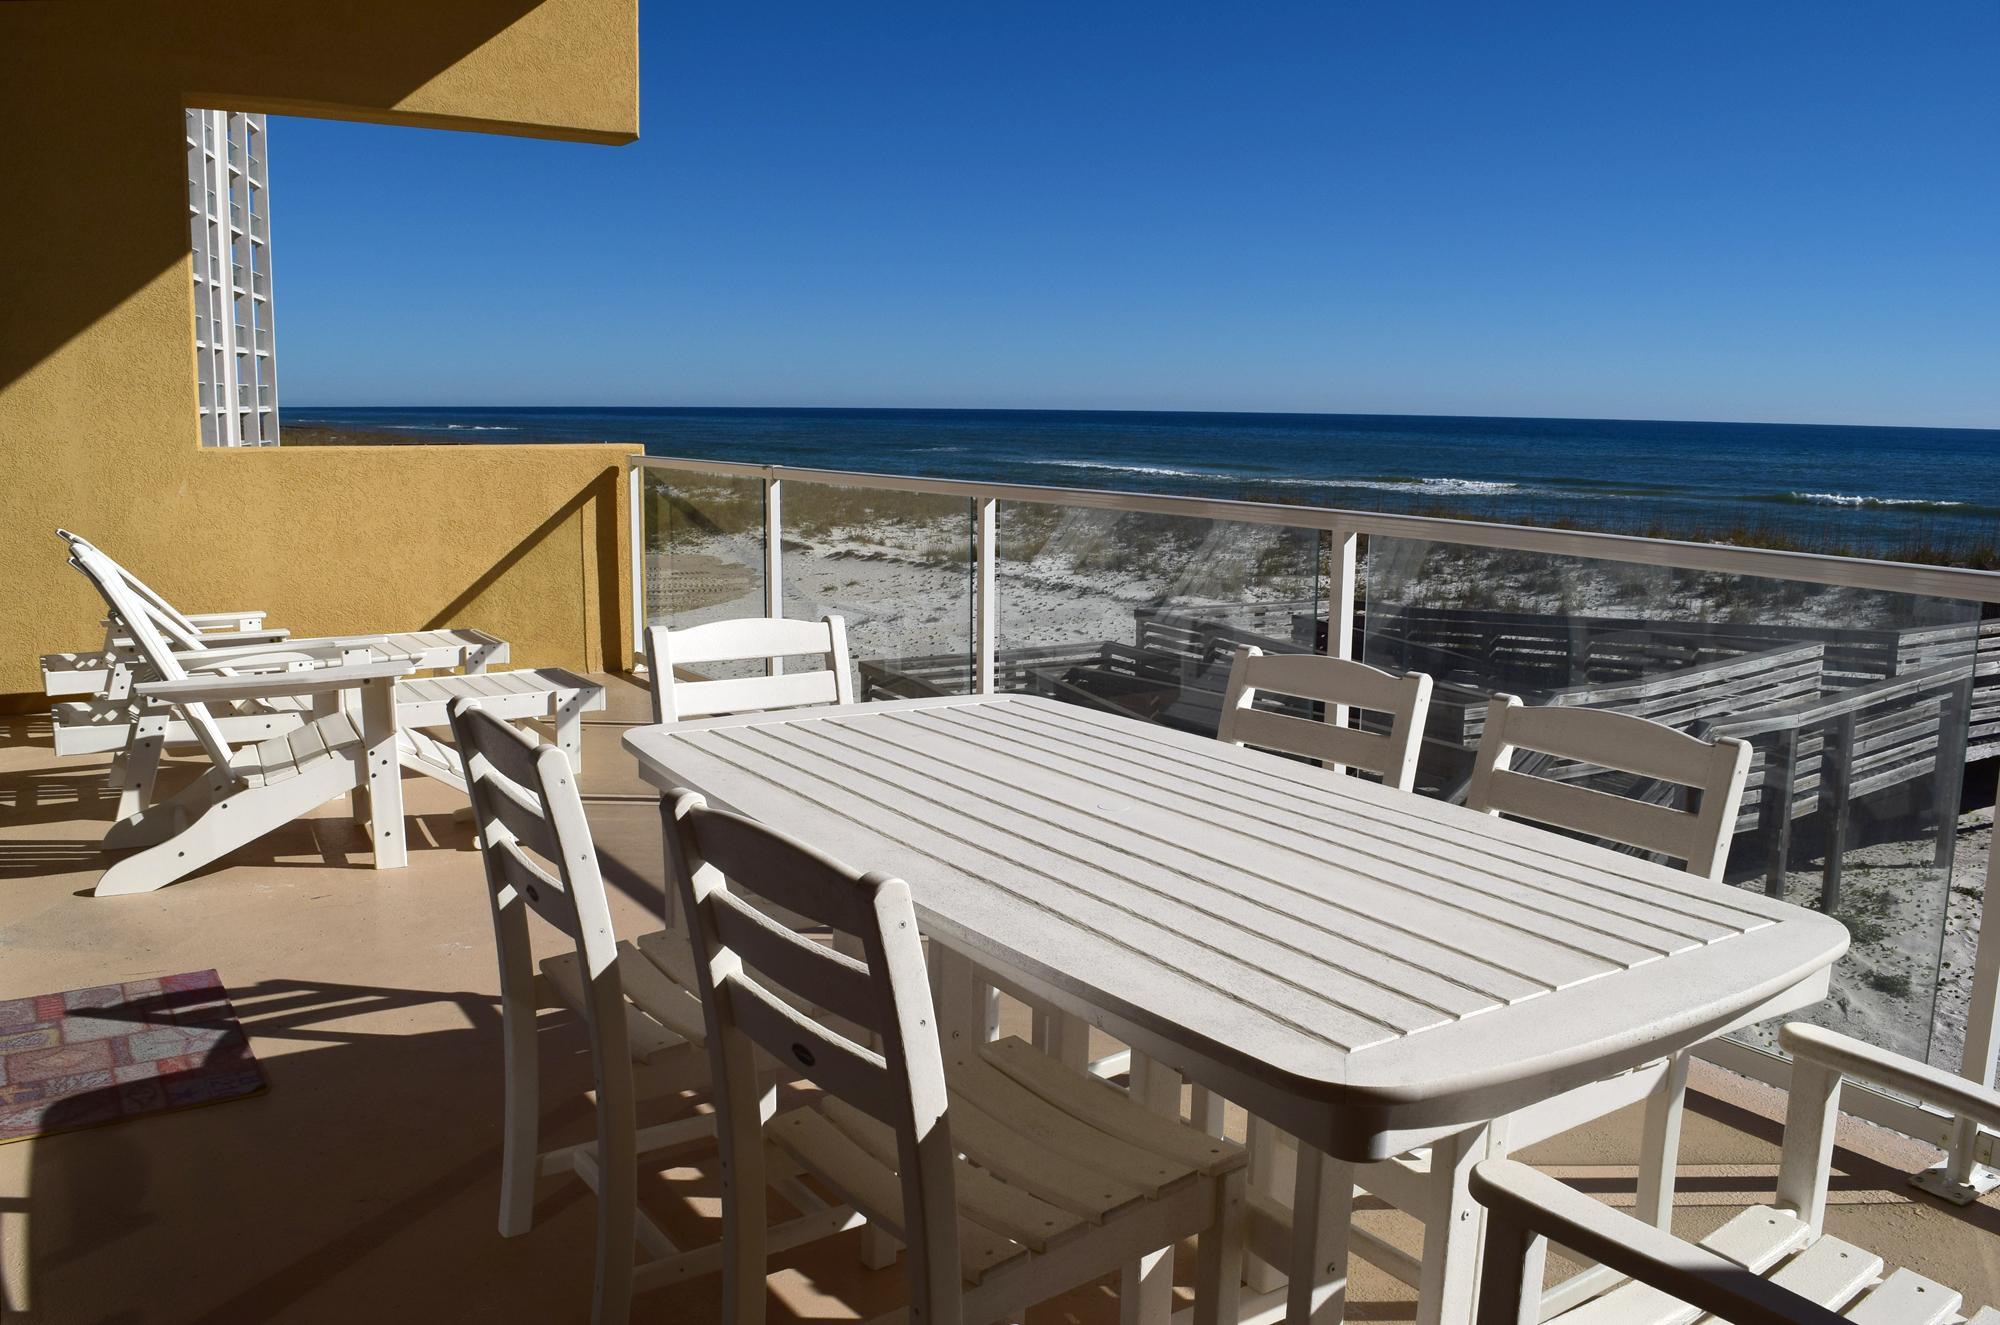 Regency Cabanas #B1 Condo rental in Regency Cabanas Pensacola Beach in Pensacola Beach Florida - #2